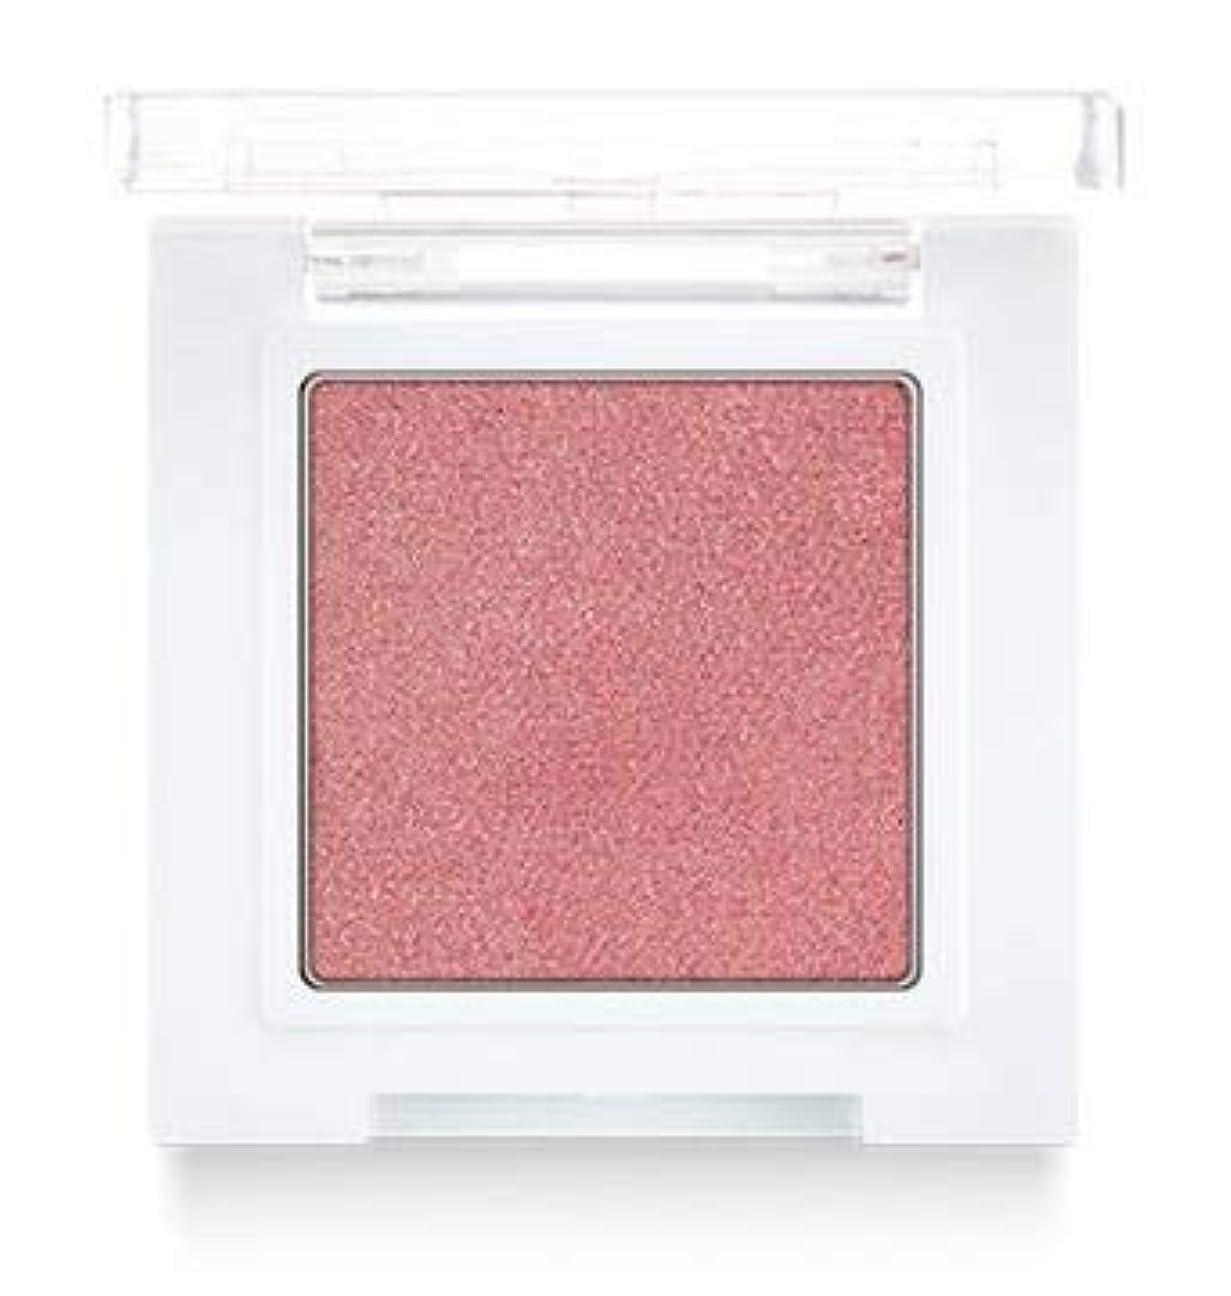 [BANILA CO] Eyecrush Shimmer Shadow 2.2g #SPK03 Marshmallow Pink / [バニラコ] アイクラッシュシマーシャドウ 2.2g #SPK03 マシュメロピンク...